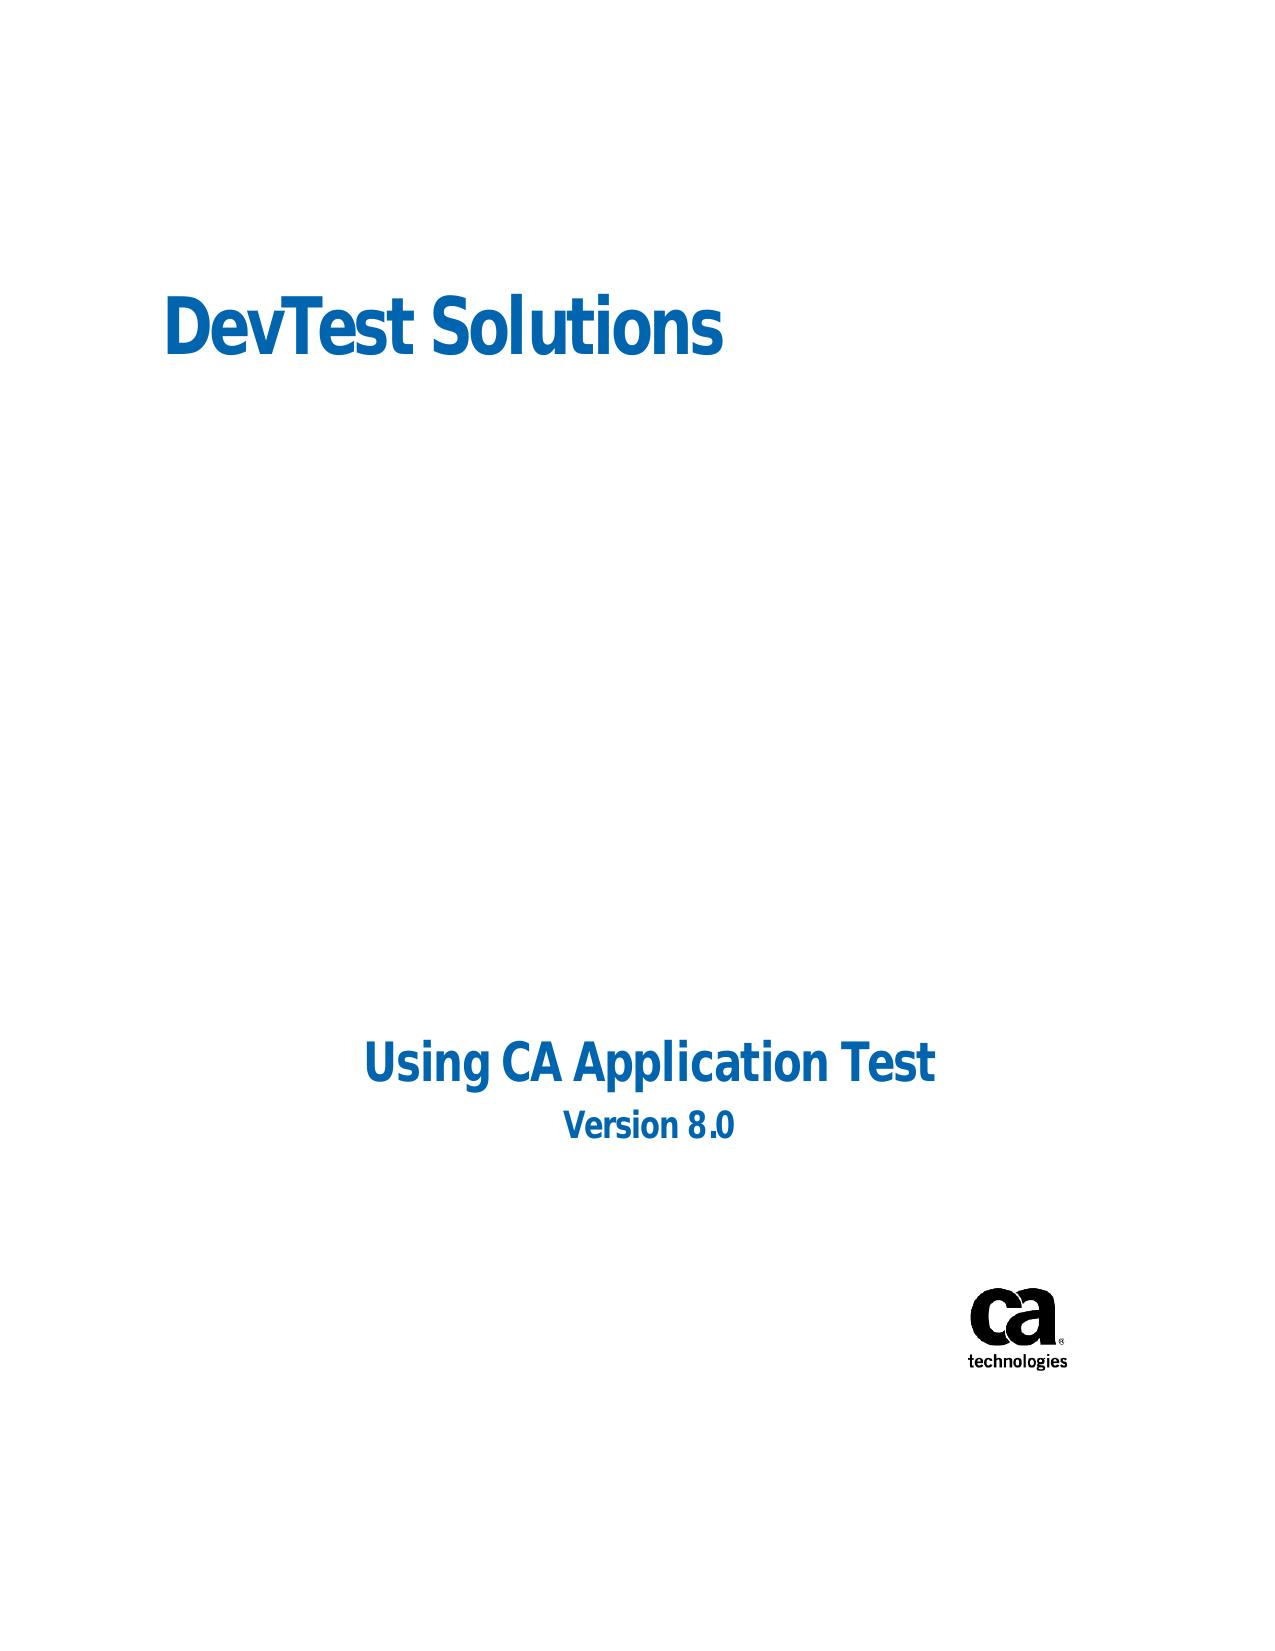 DevTest Solutions Using CA Application Test | manualzz com